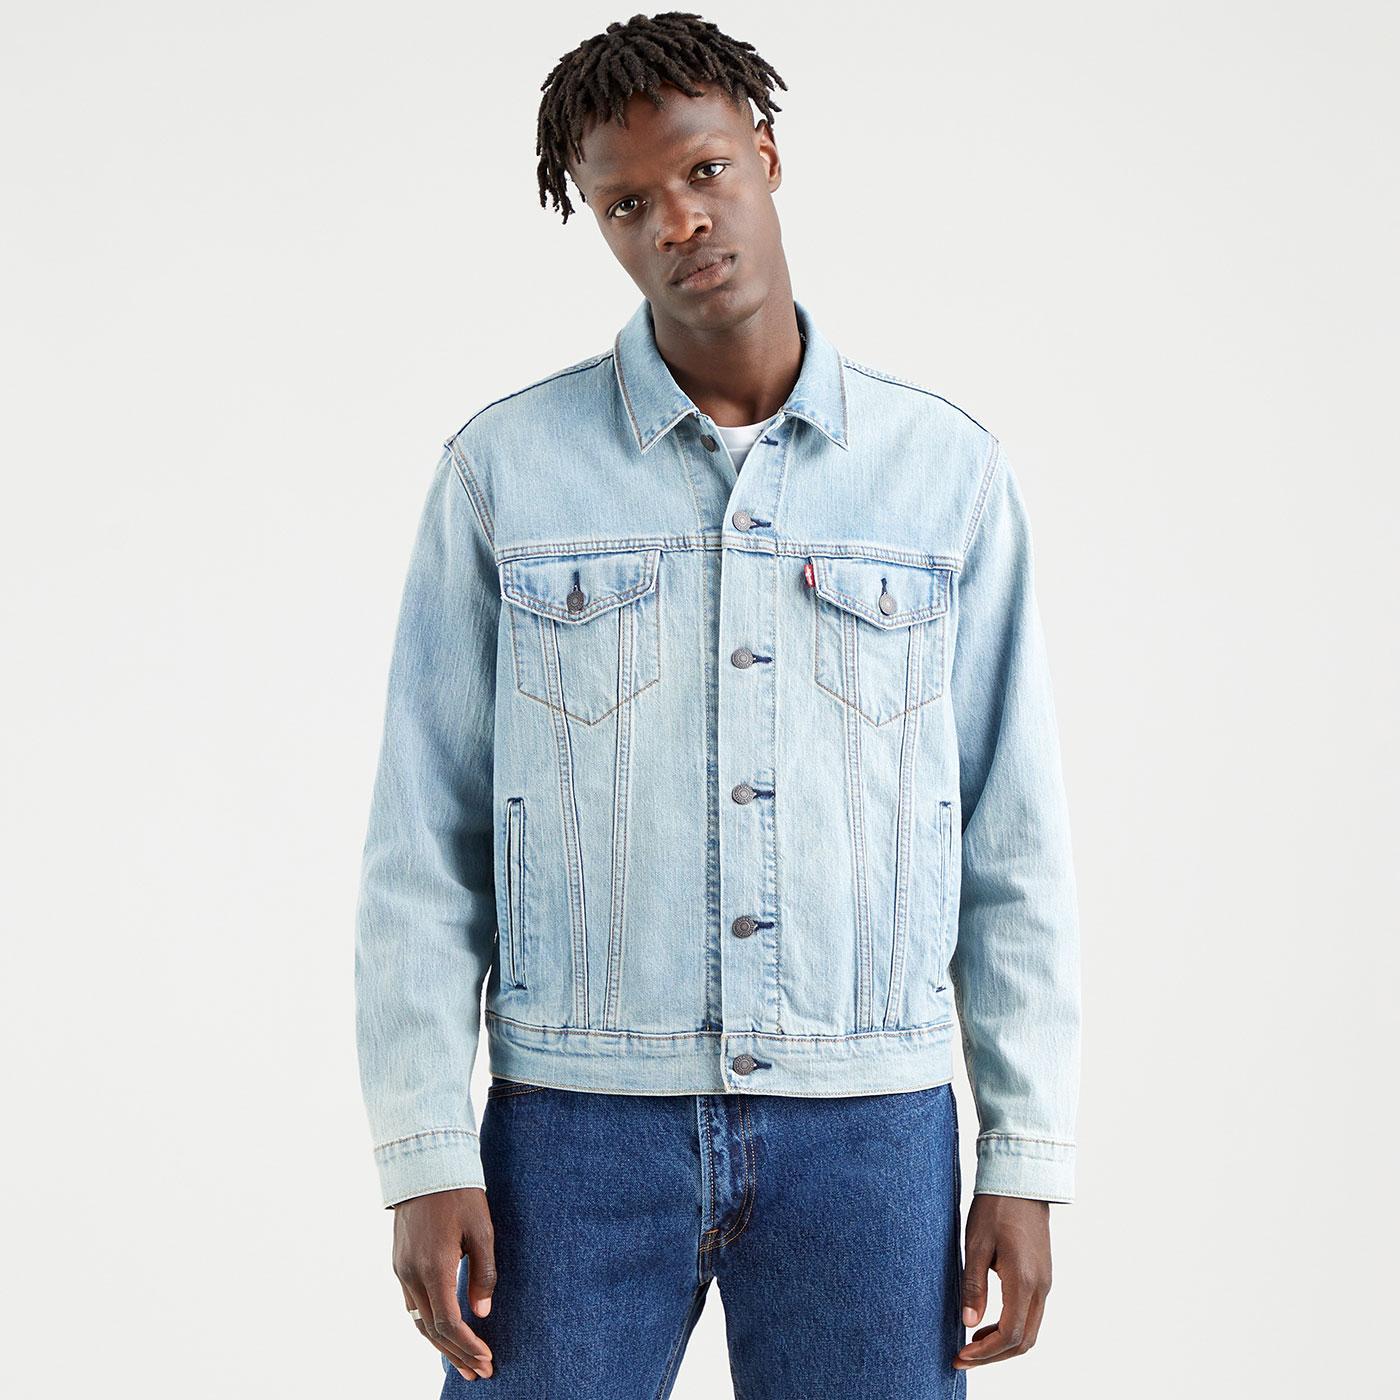 LEVI'S Mod Denim Trucker Jacket (Colder Than Ice)